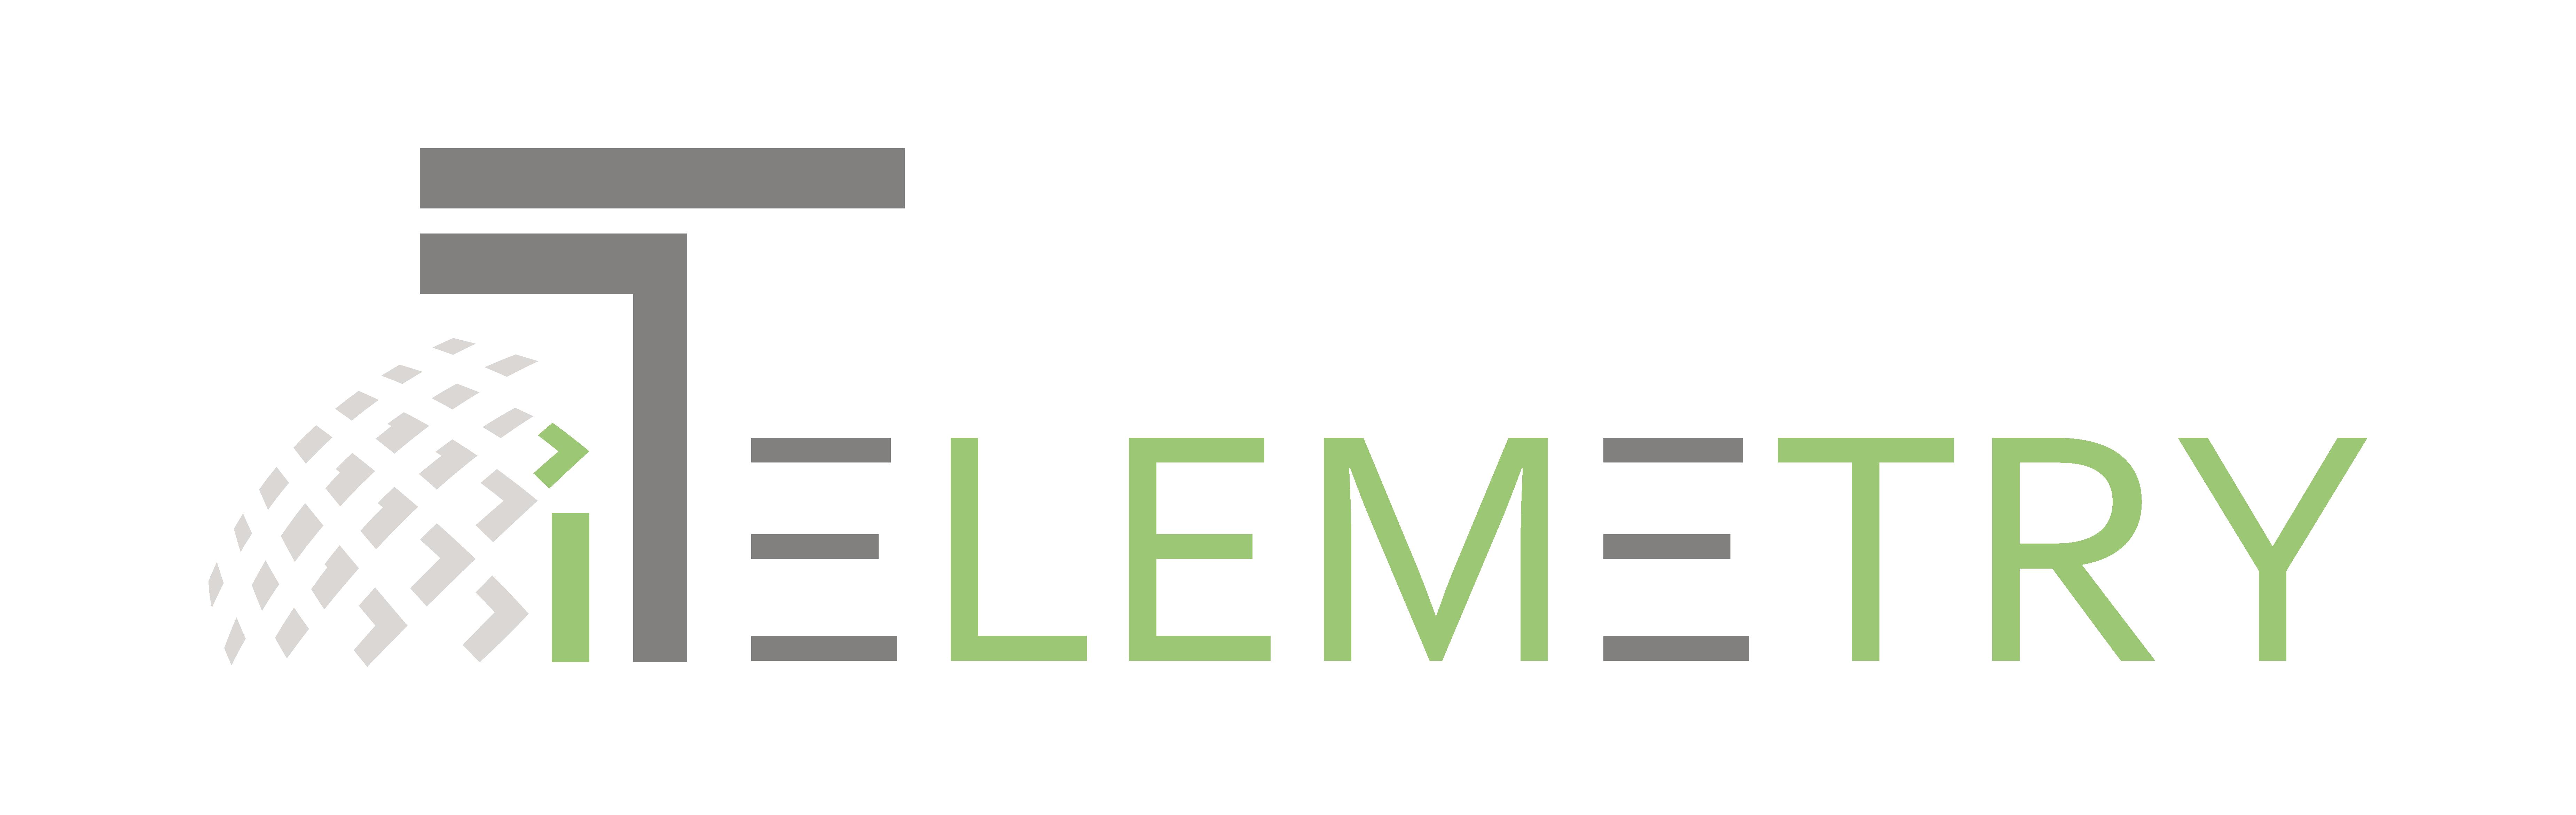 iTelemetry Technologies Pvt. Ltd.